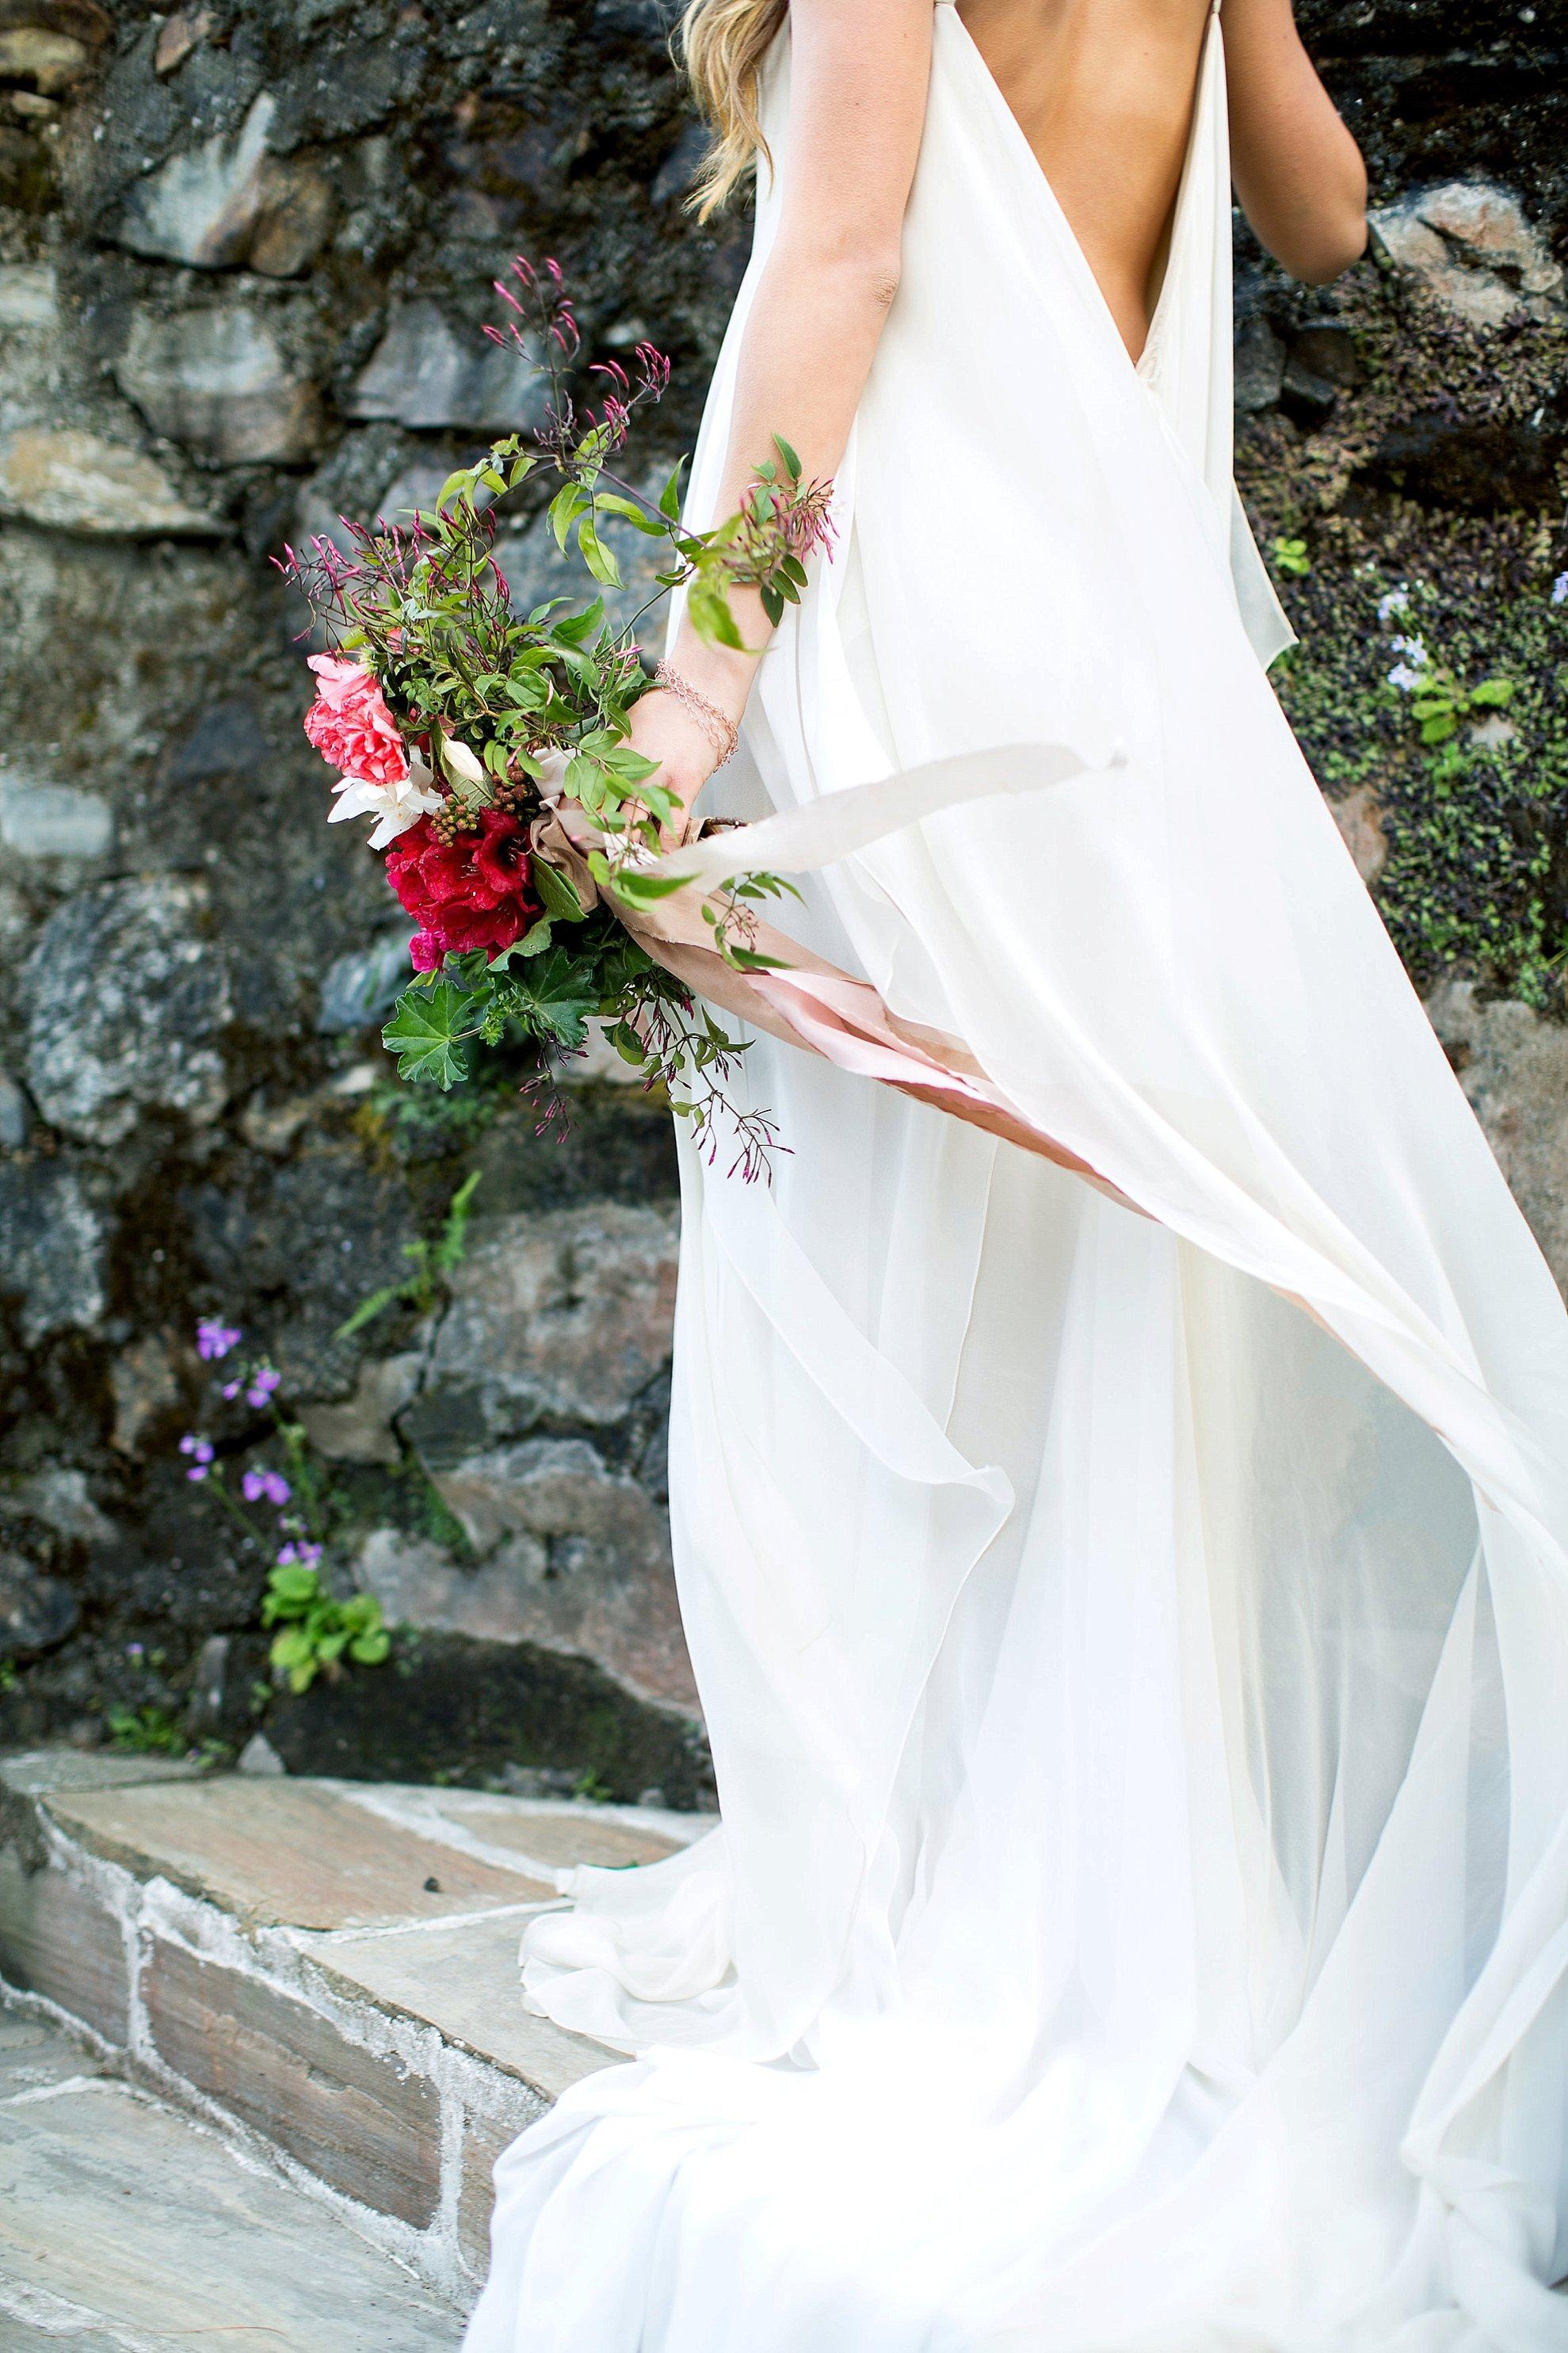 Bianca-Rijkenbarg-fotografie-for-this-romance-bruidsinspiratie-blog_0013